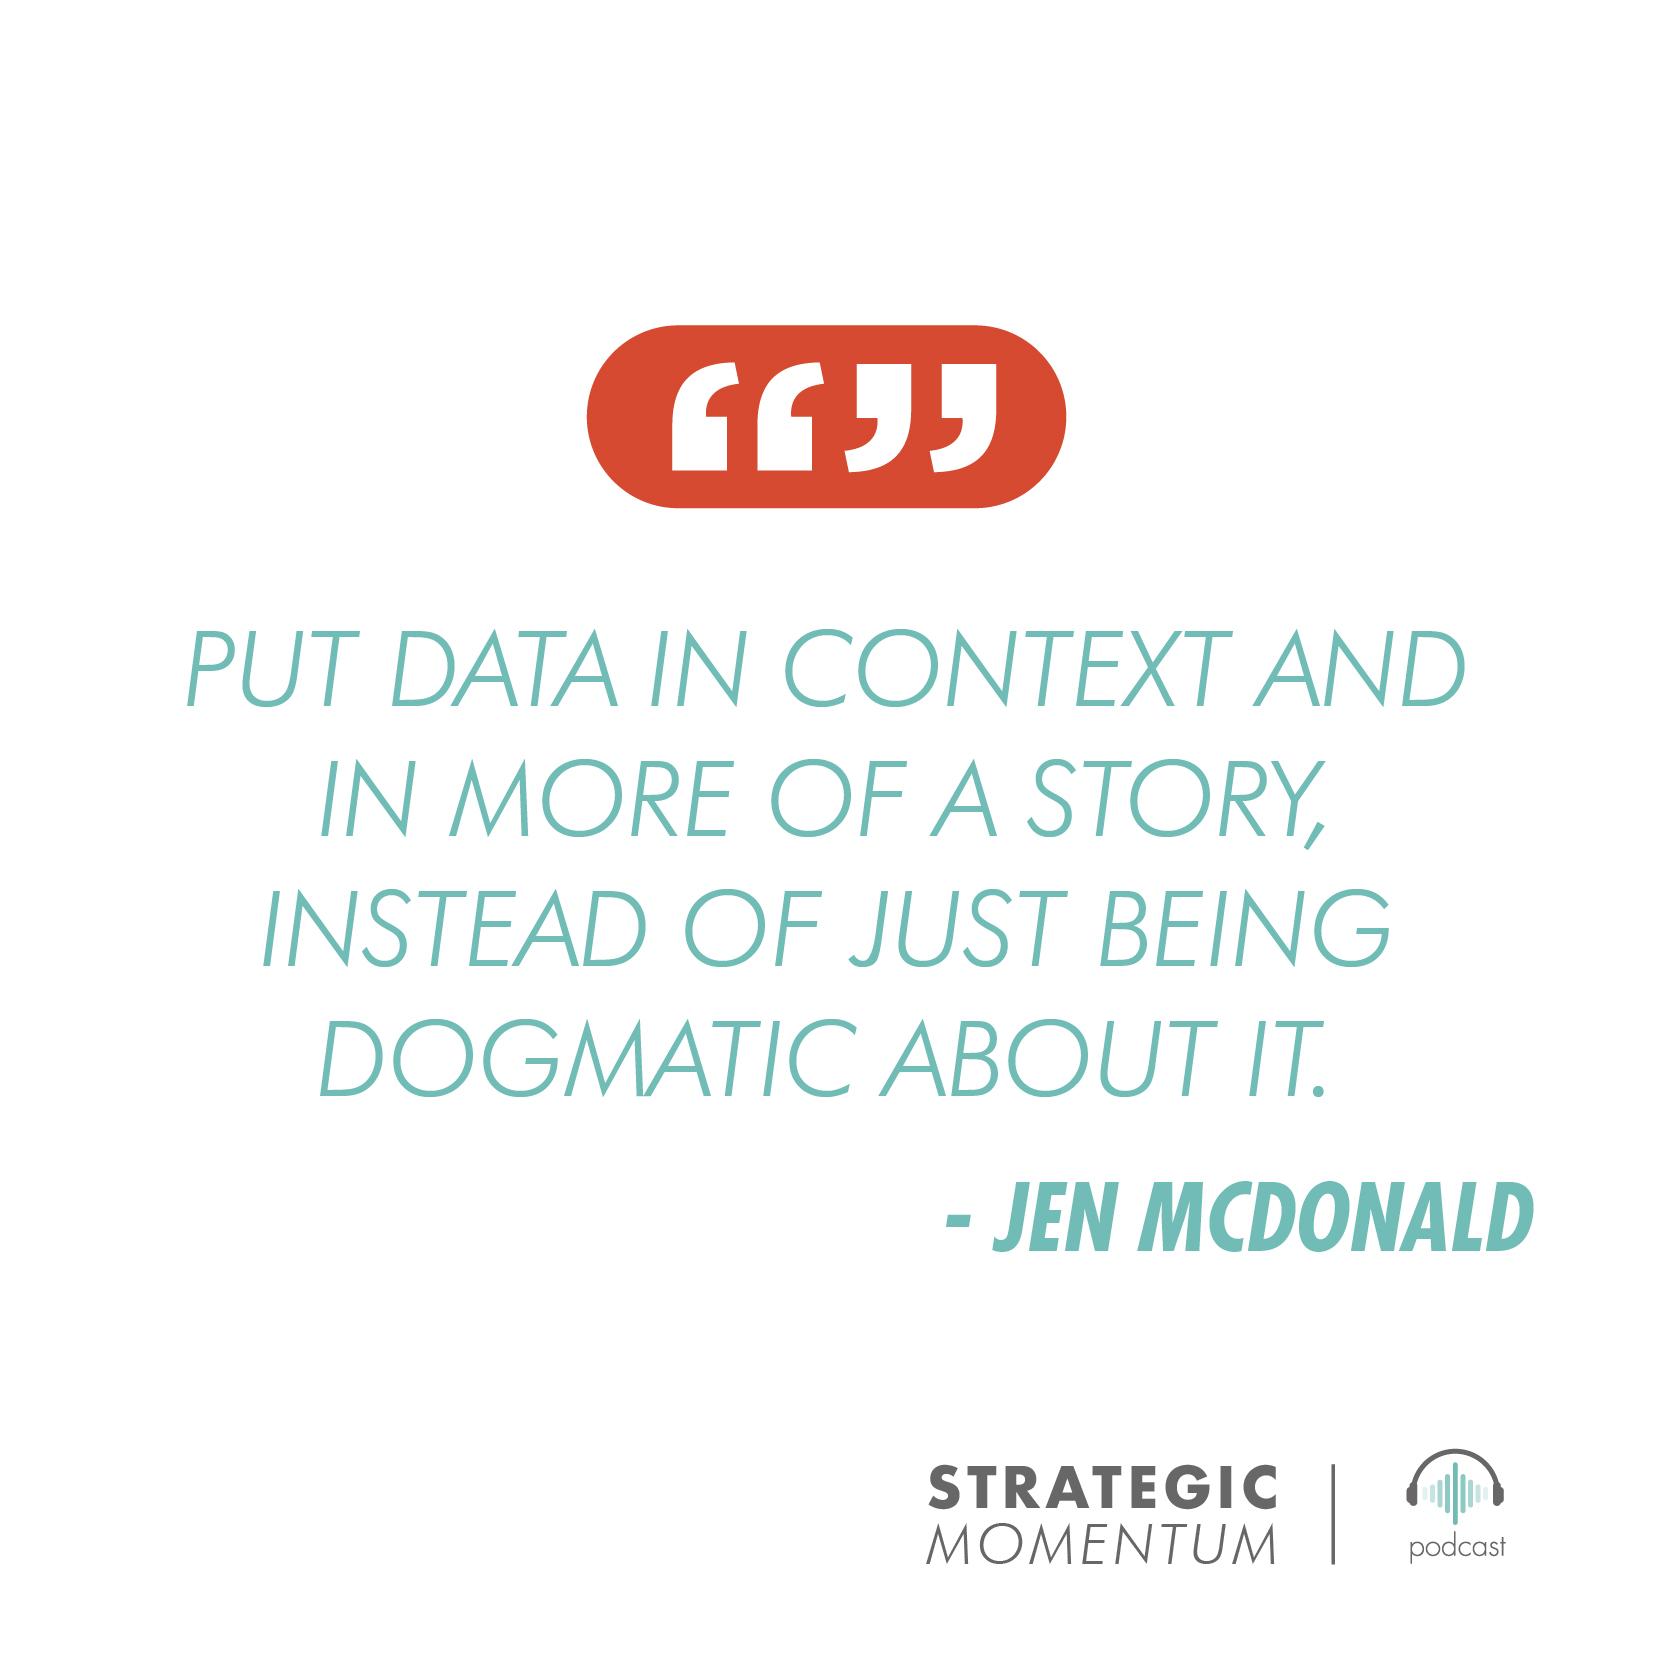 Jen McDonald Quote | Strategic Momentum Podcast